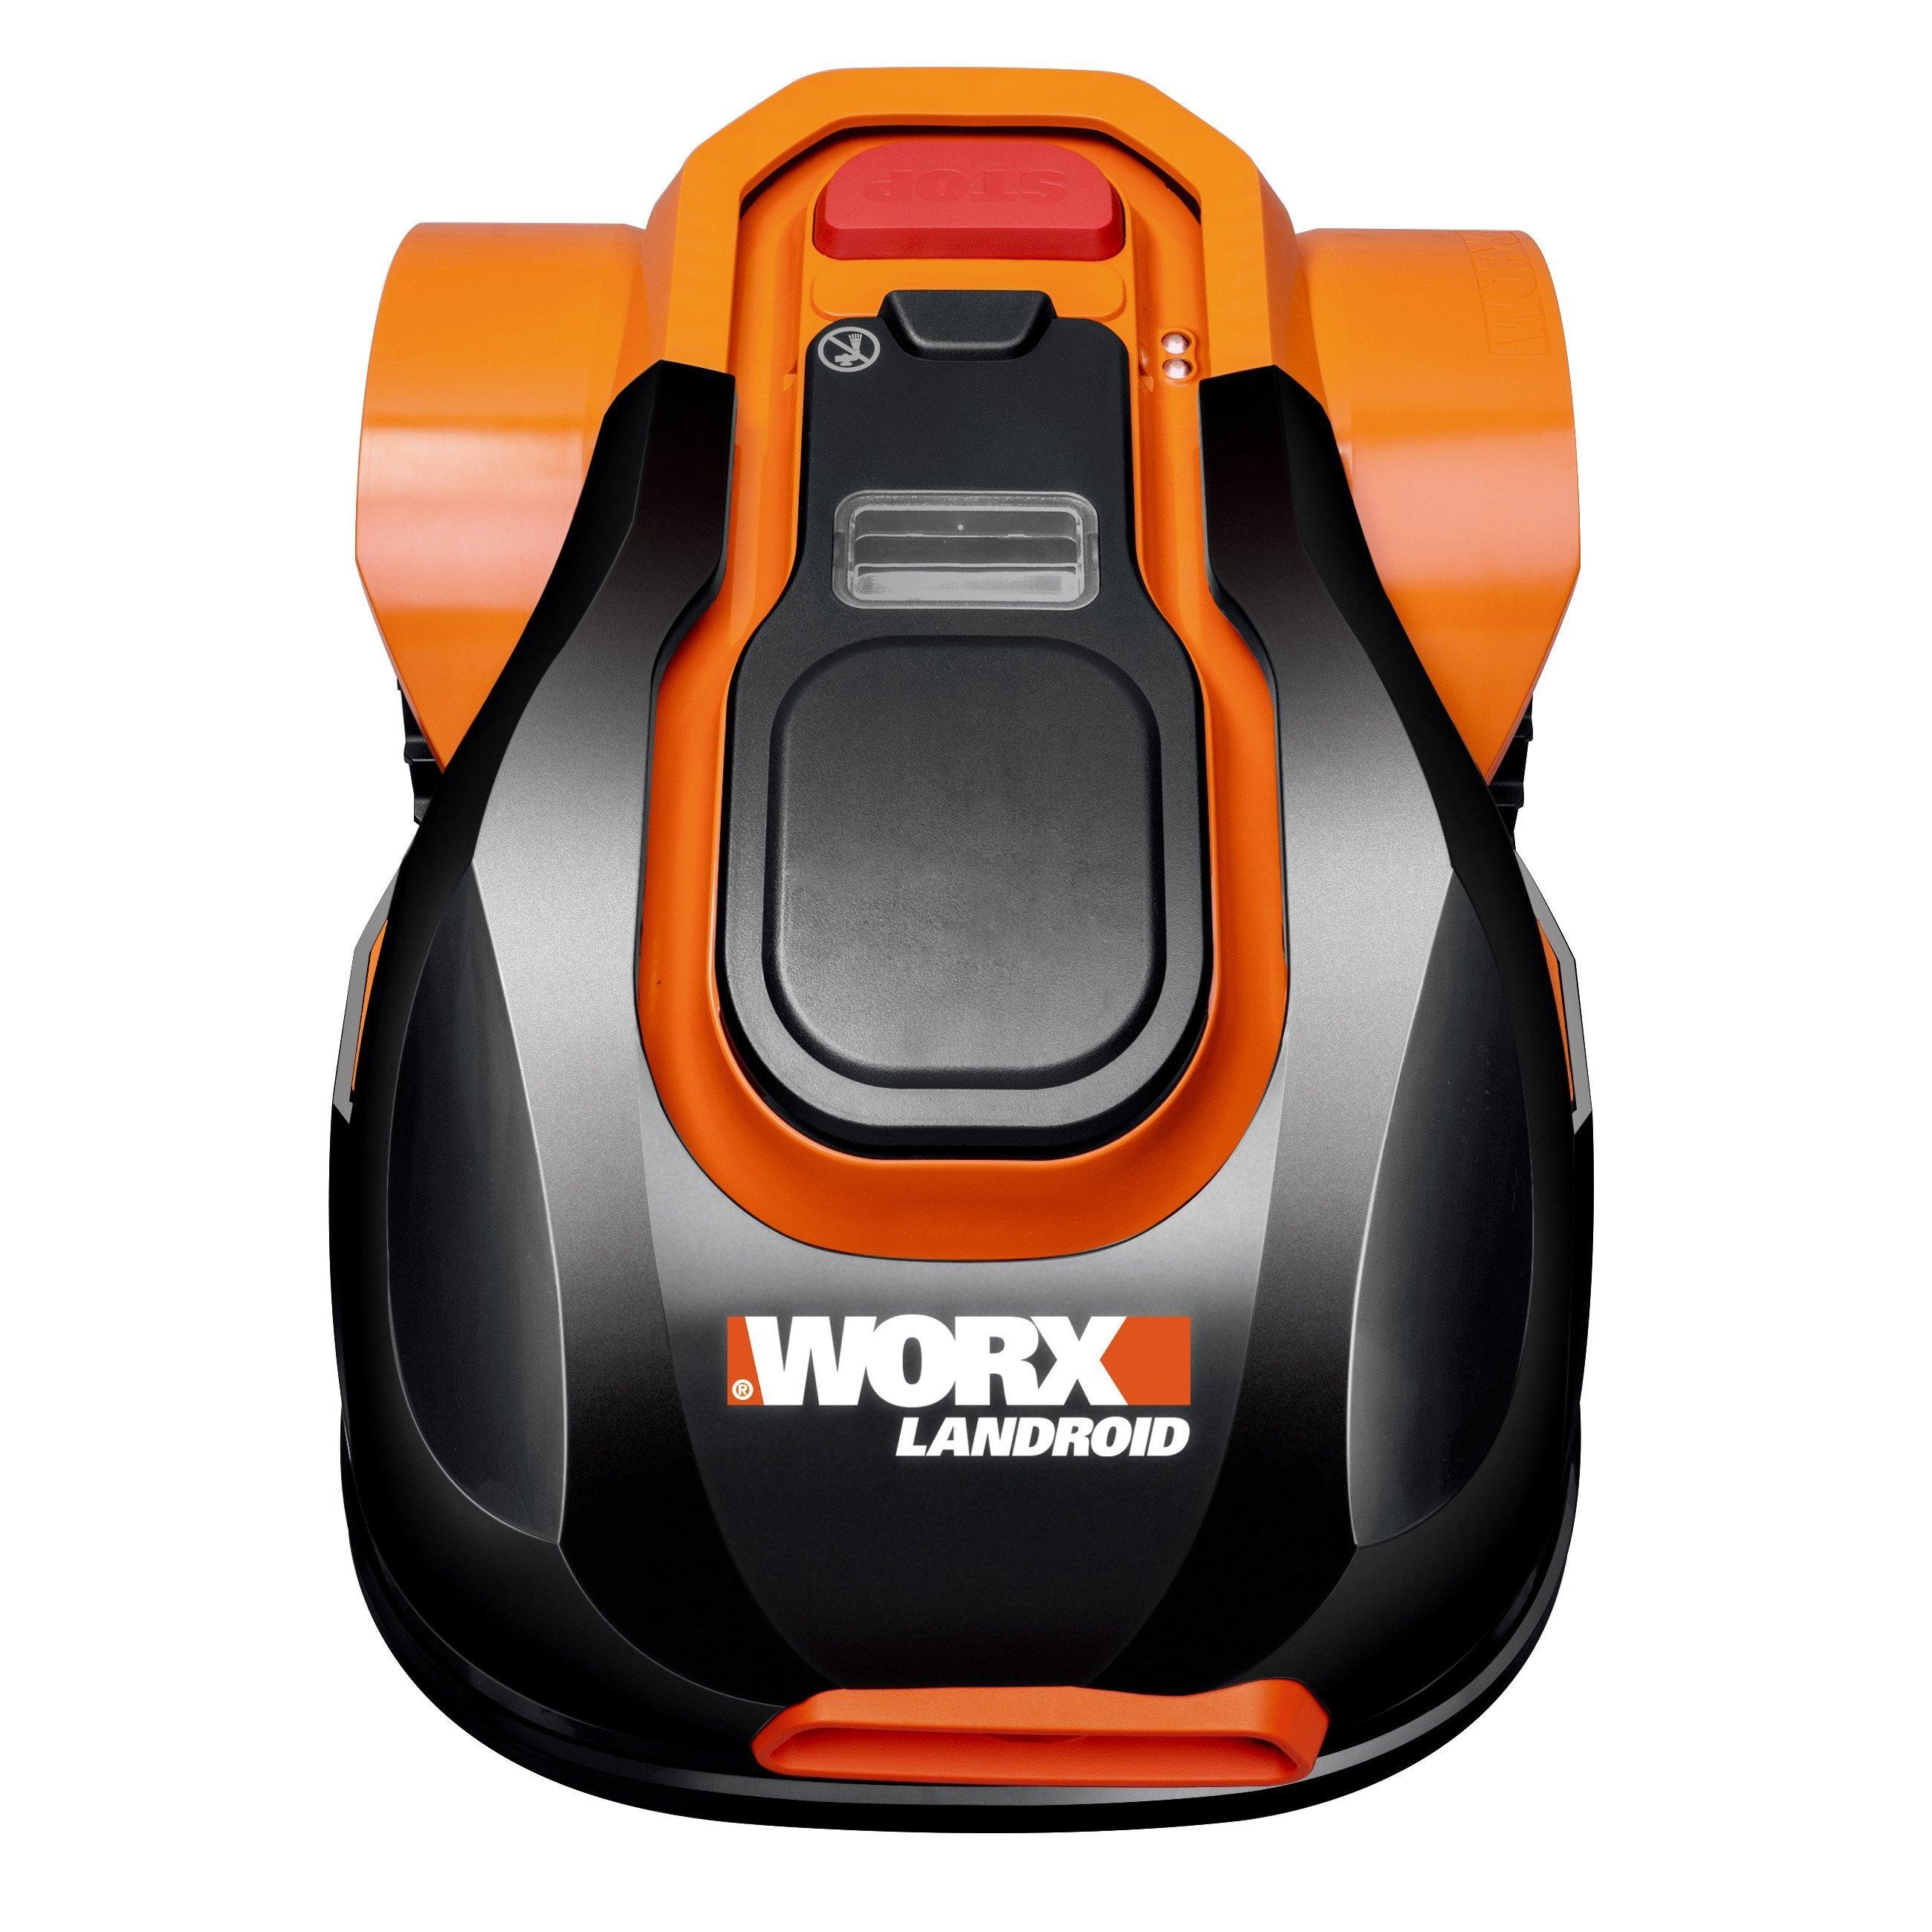 worx-landroid-wr111mi-rasen-maeh-الروبوت